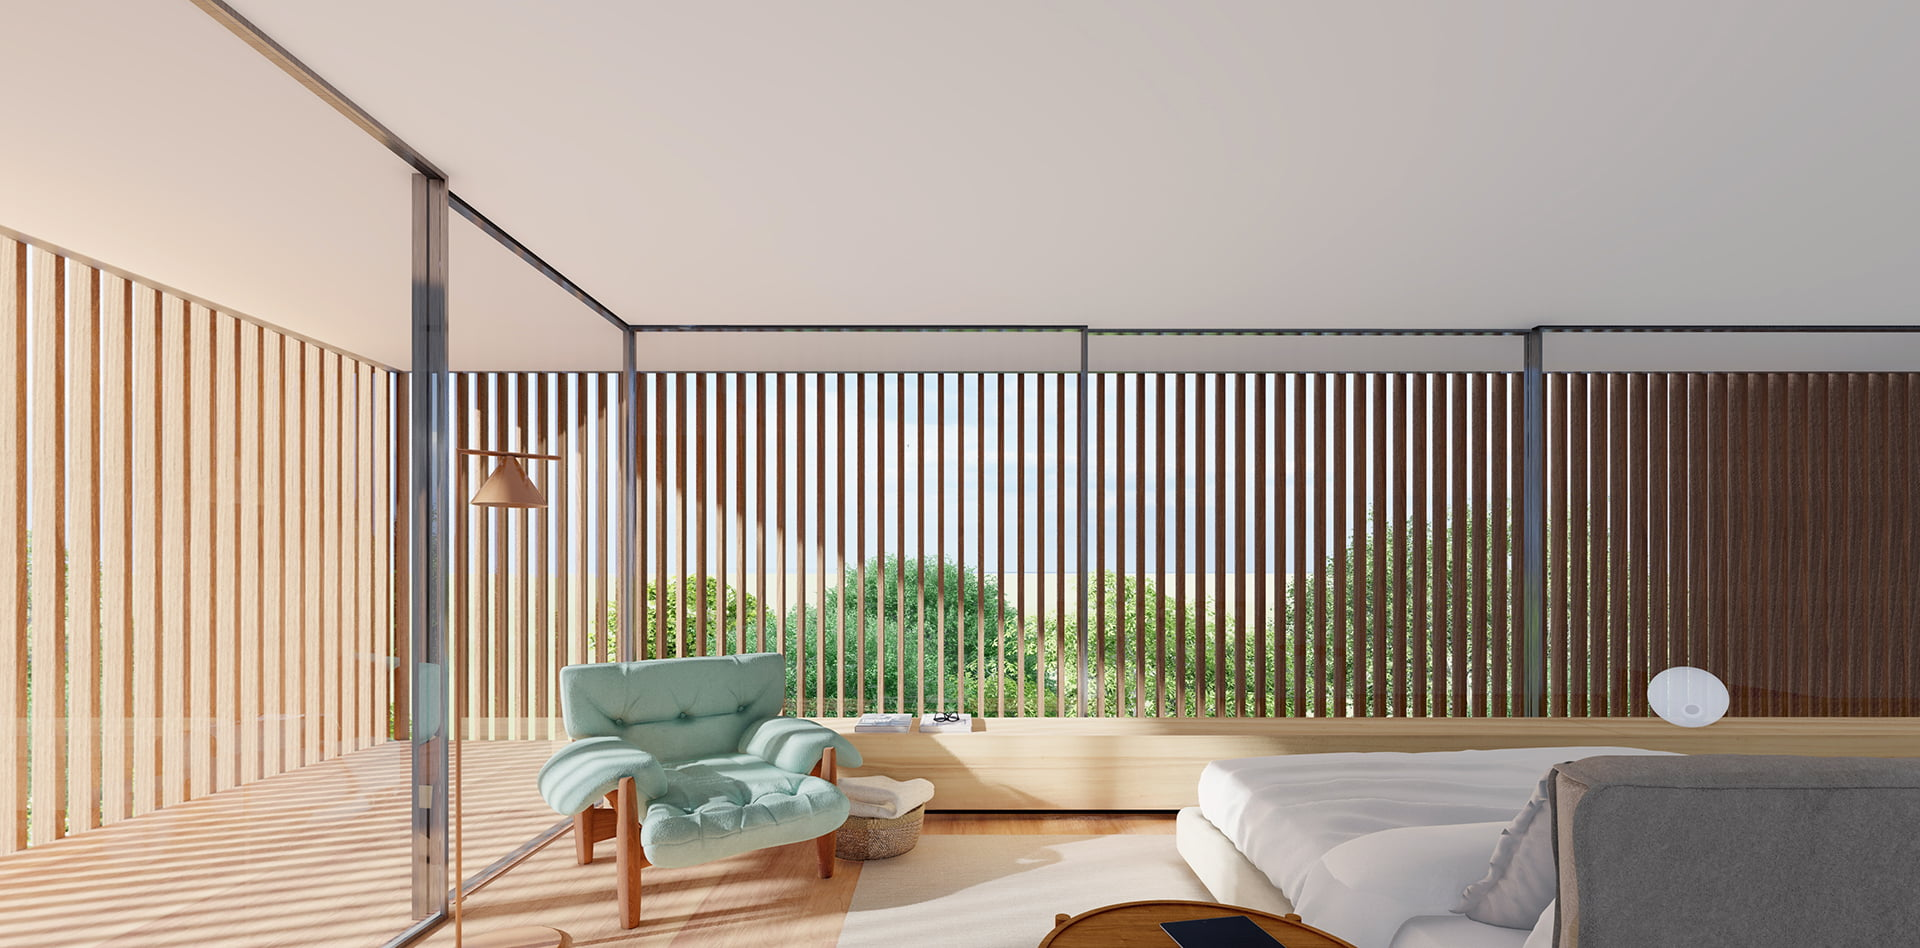 Sabella Arquitetura - Casa da Escultura - master